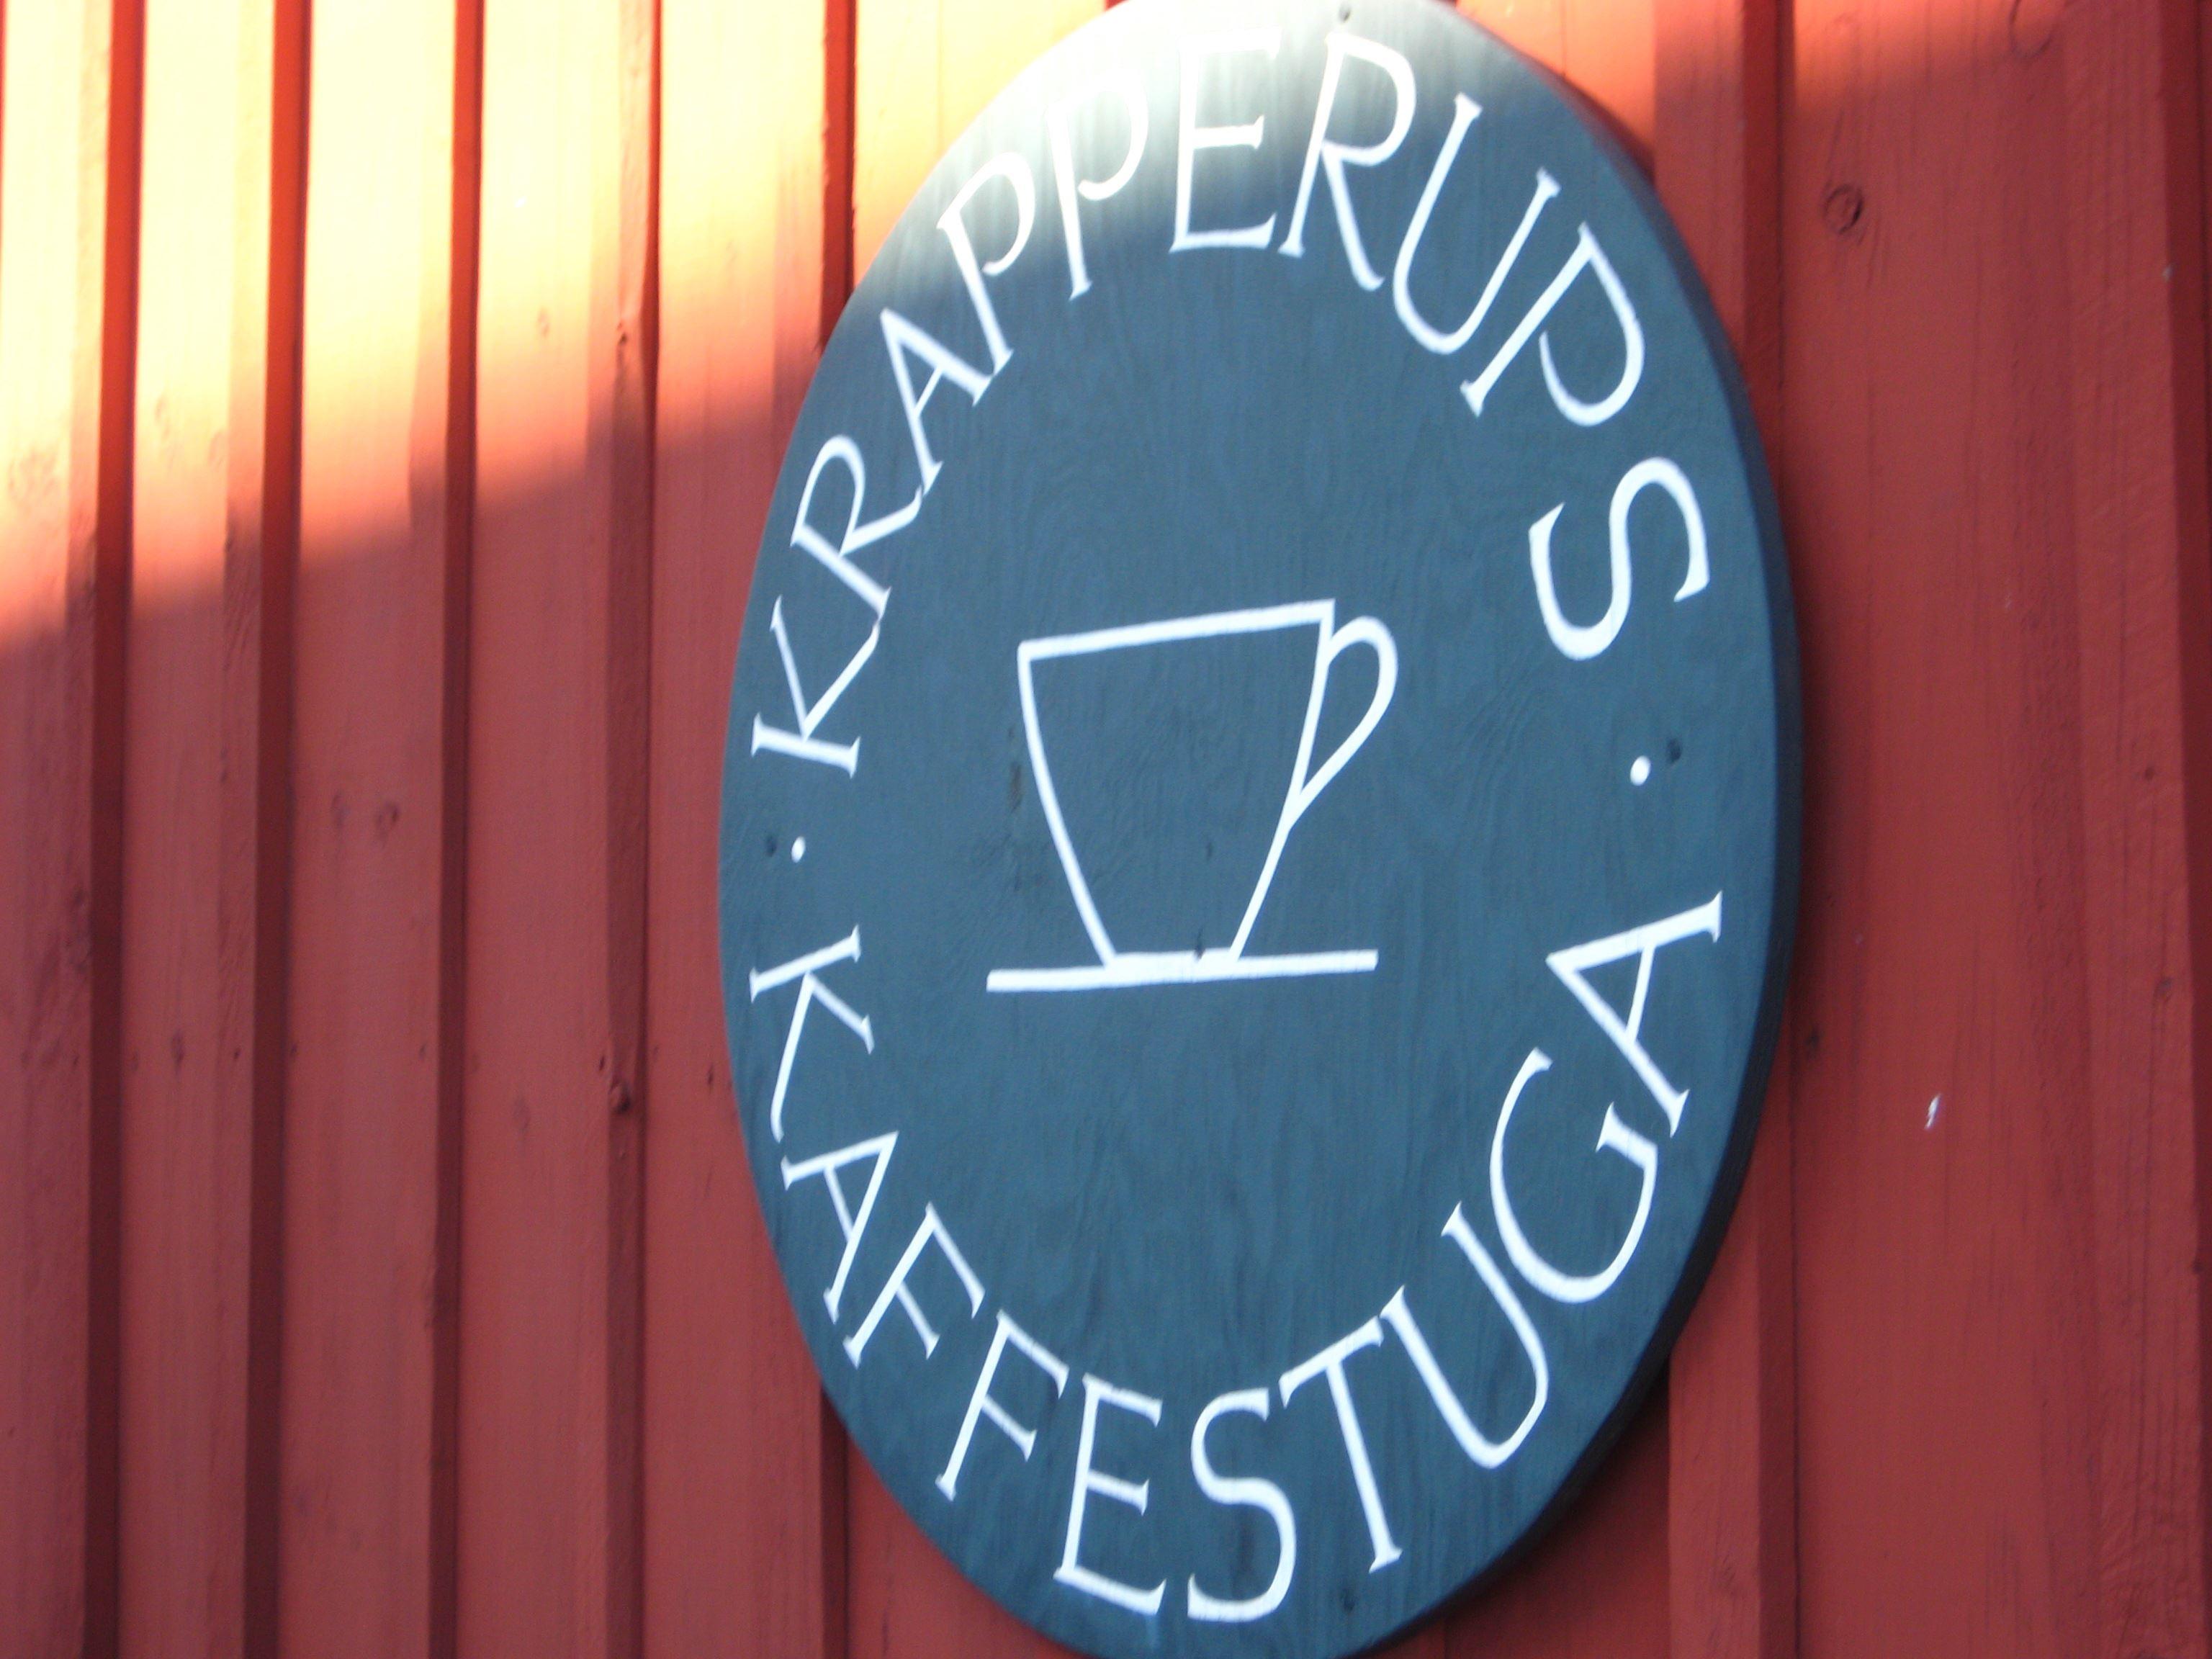 Jenny Rasmussen, Krapperups Kaffestuga